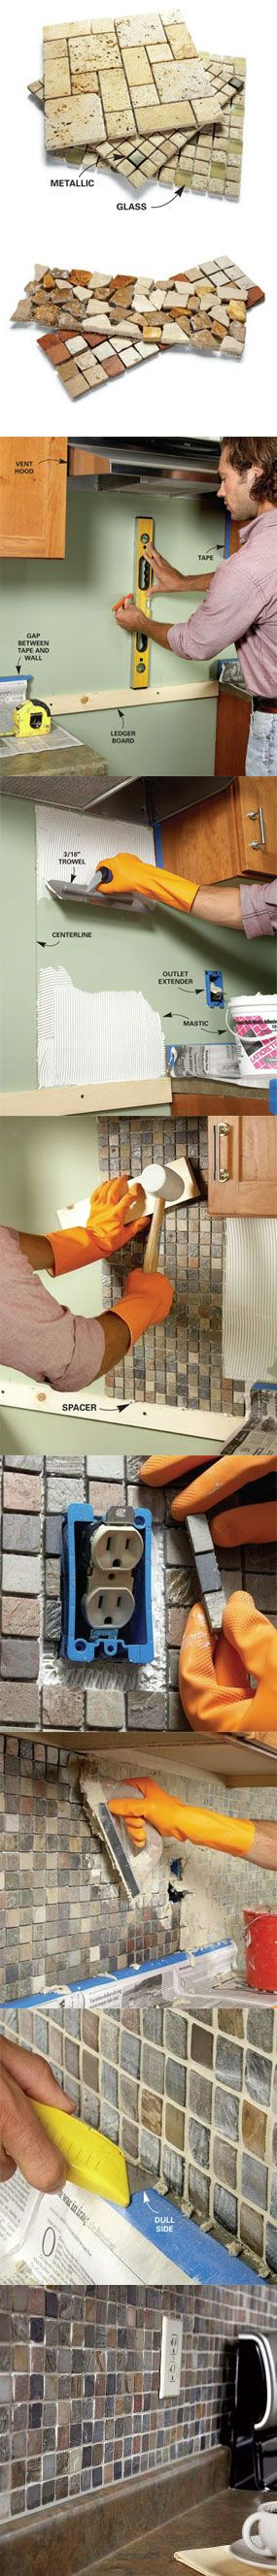 Learn how to create a mosaic tile backsplash.